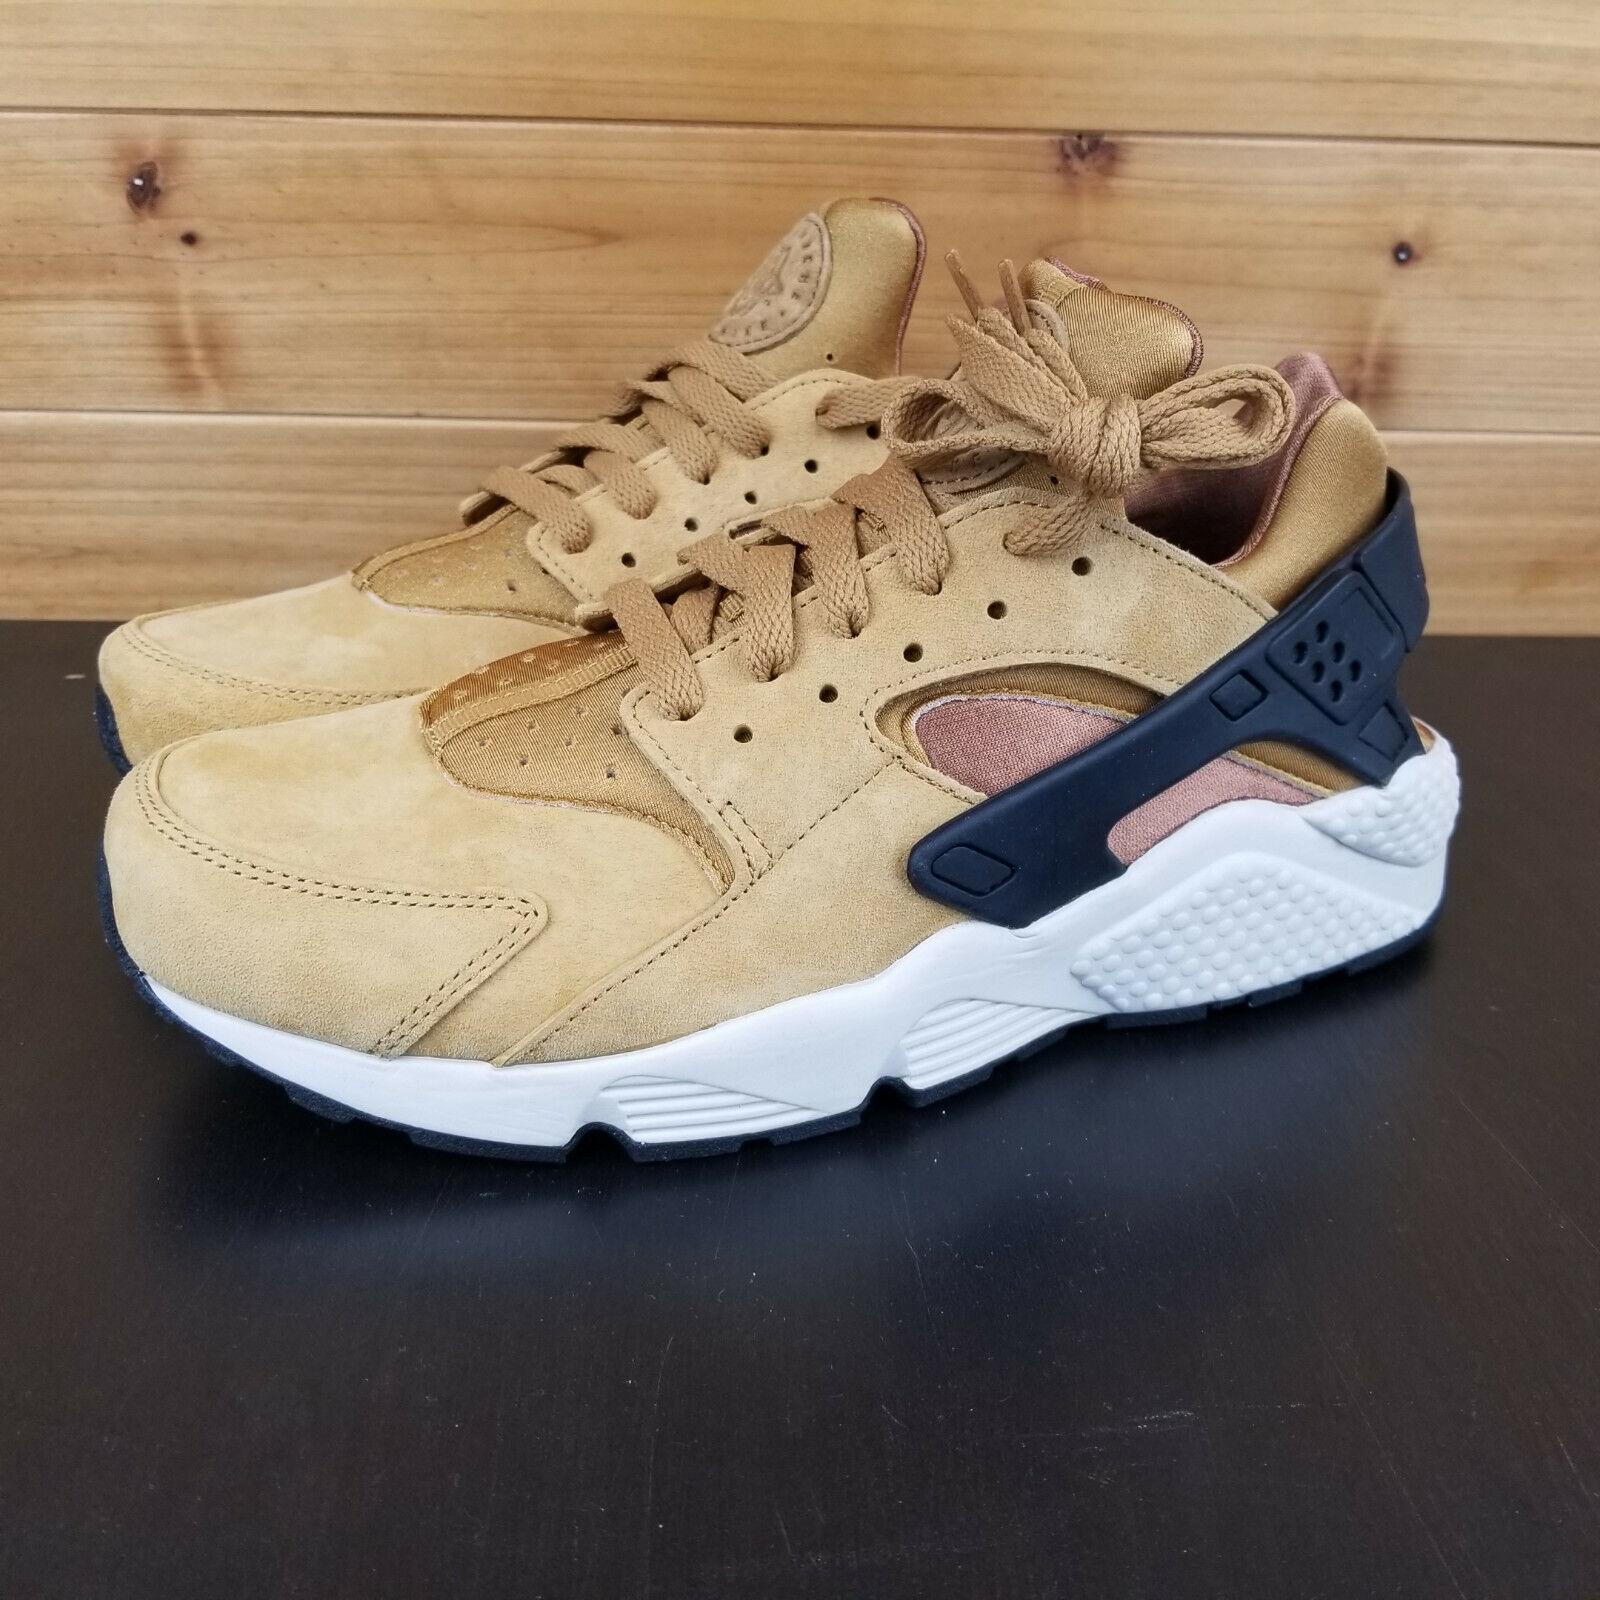 Nike Air Huarache PRM  Men's shoes Sz 9 WHEAT BLACK-LIGHT BROWN 704830-700